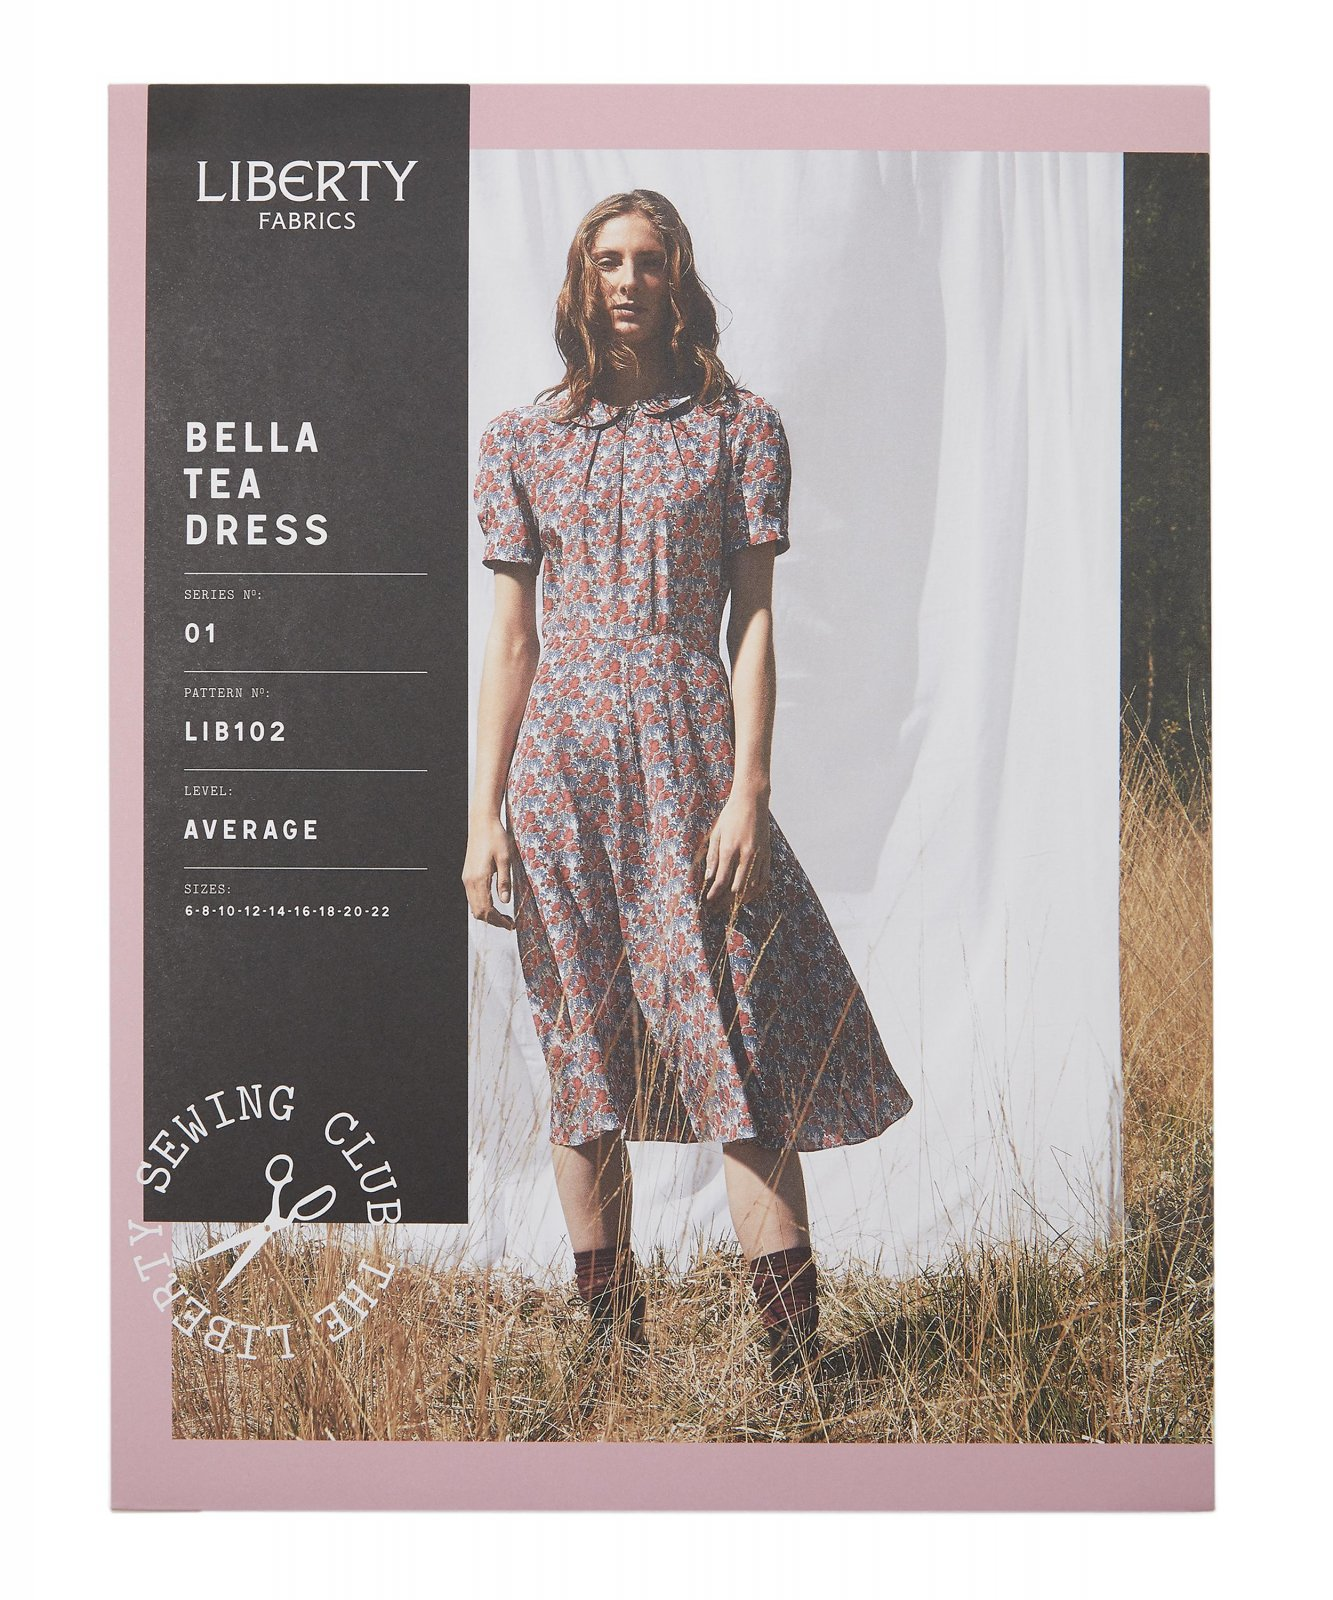 Liberty Fabrics Bella Tea Dress